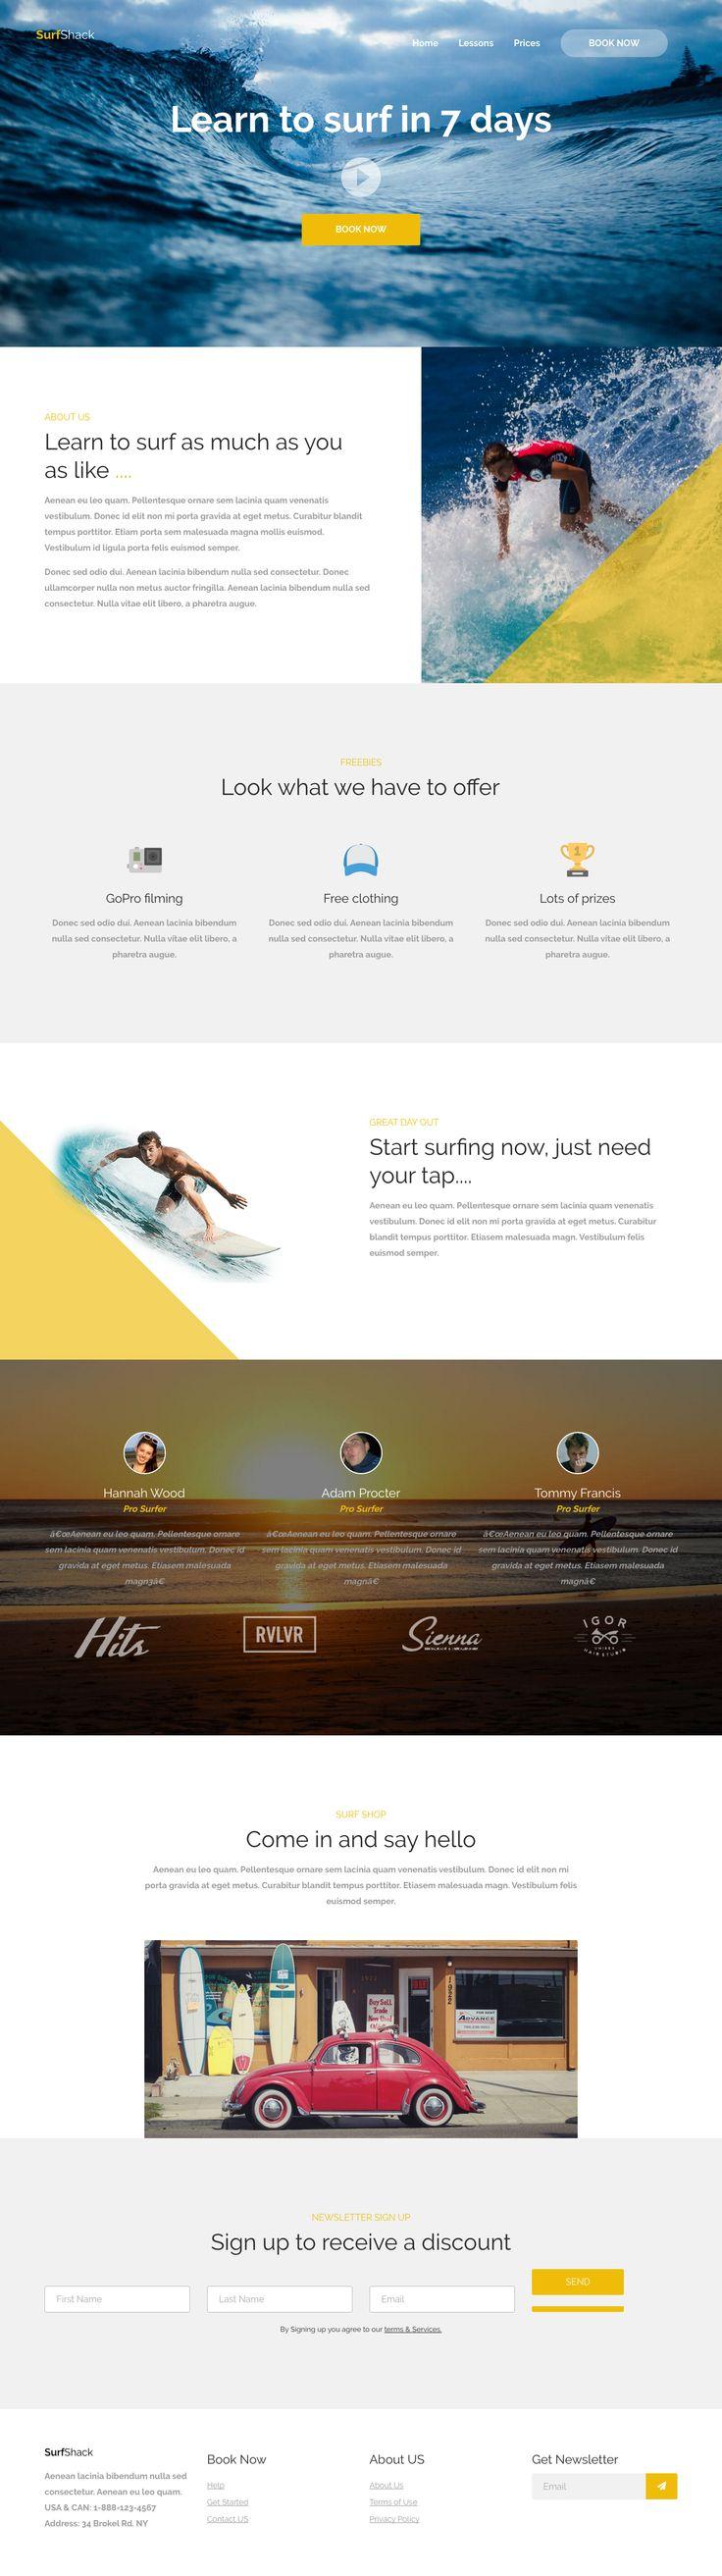 Surf Shack frontpage. See the live version: http://jjsd.co.uk/freebies/surf-shack/